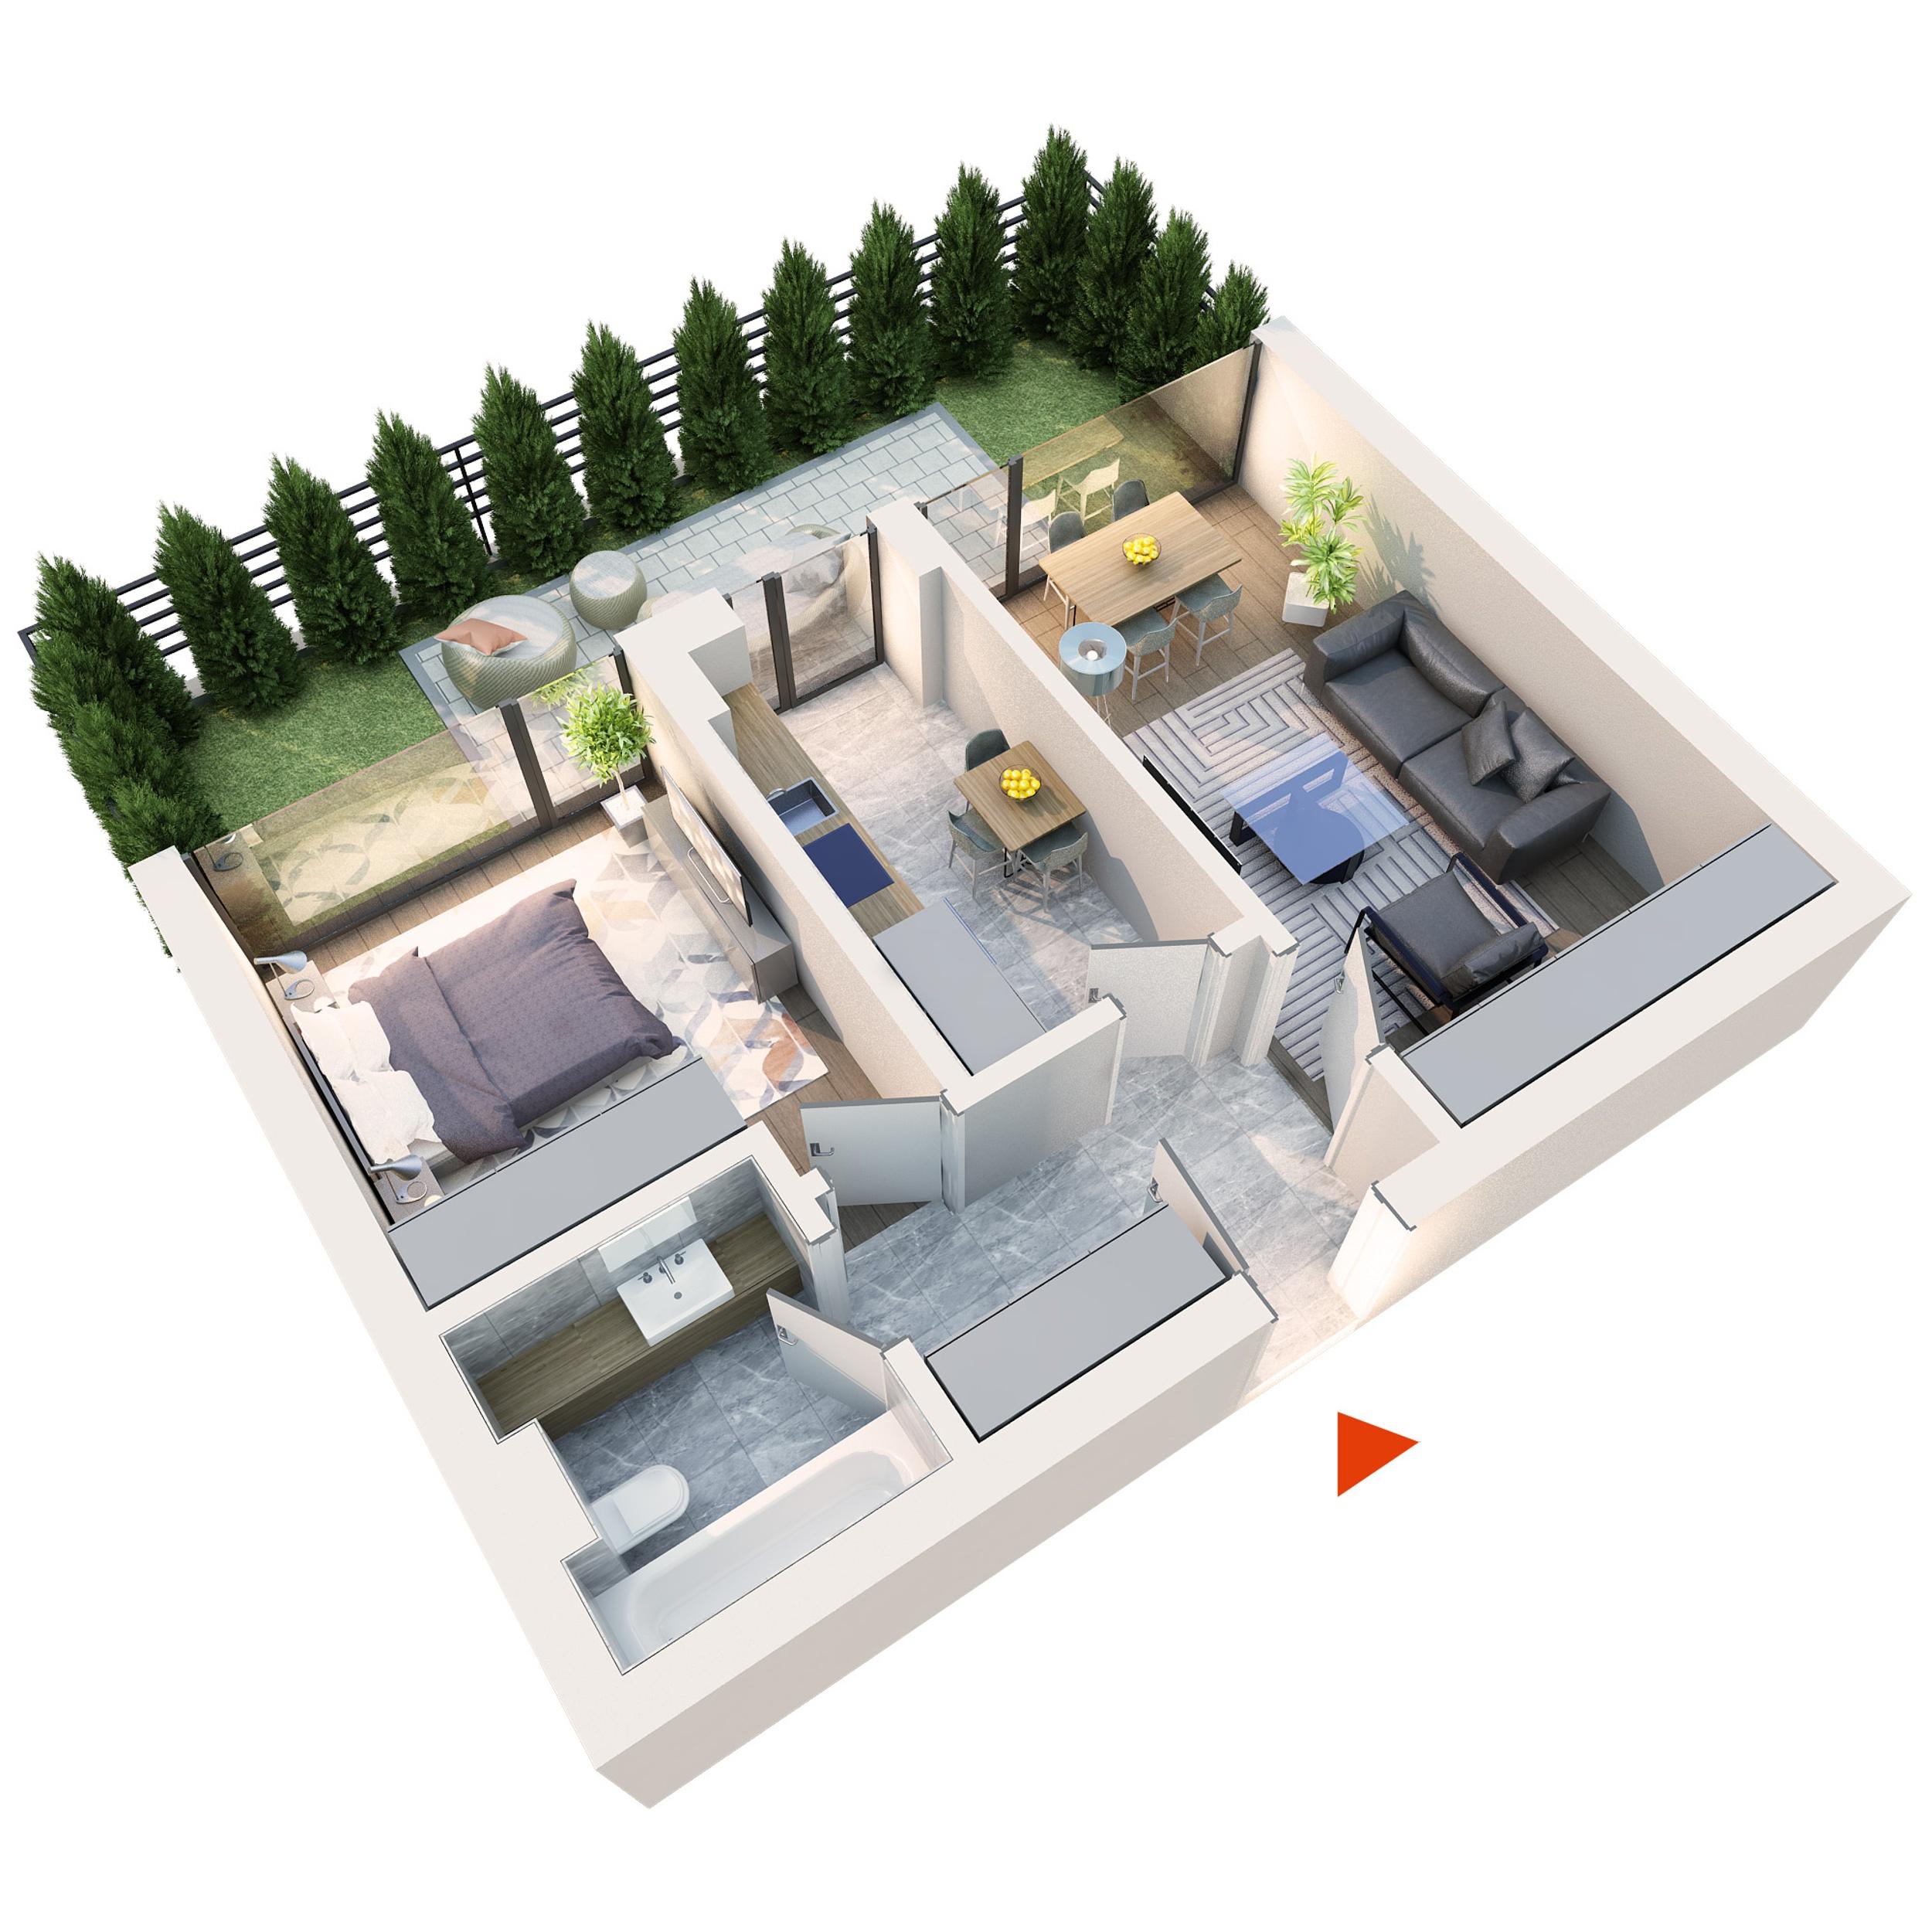 Apartament 2 camere tip 2A1′ gradina | Parter | Corp C3 și C4 | Faza 2